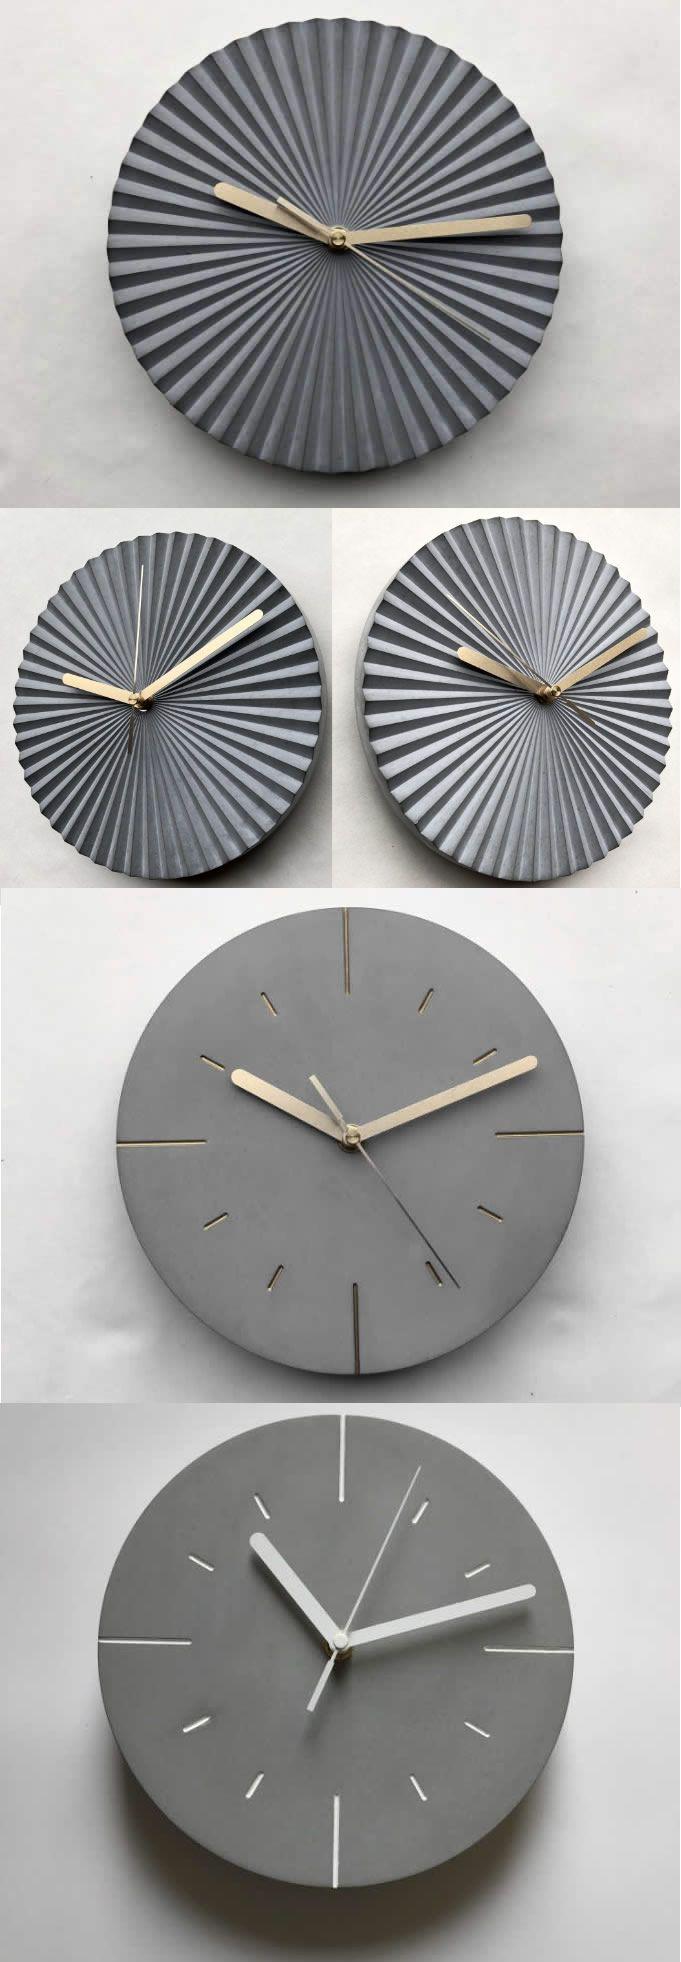 Natural Texture Of Modern Concrete Circle Wall Clock Modern Structure Cement Wall Clock Concrete Clock I Ll Try Thi Clock Wall Decor Clock Wall Clock Modern